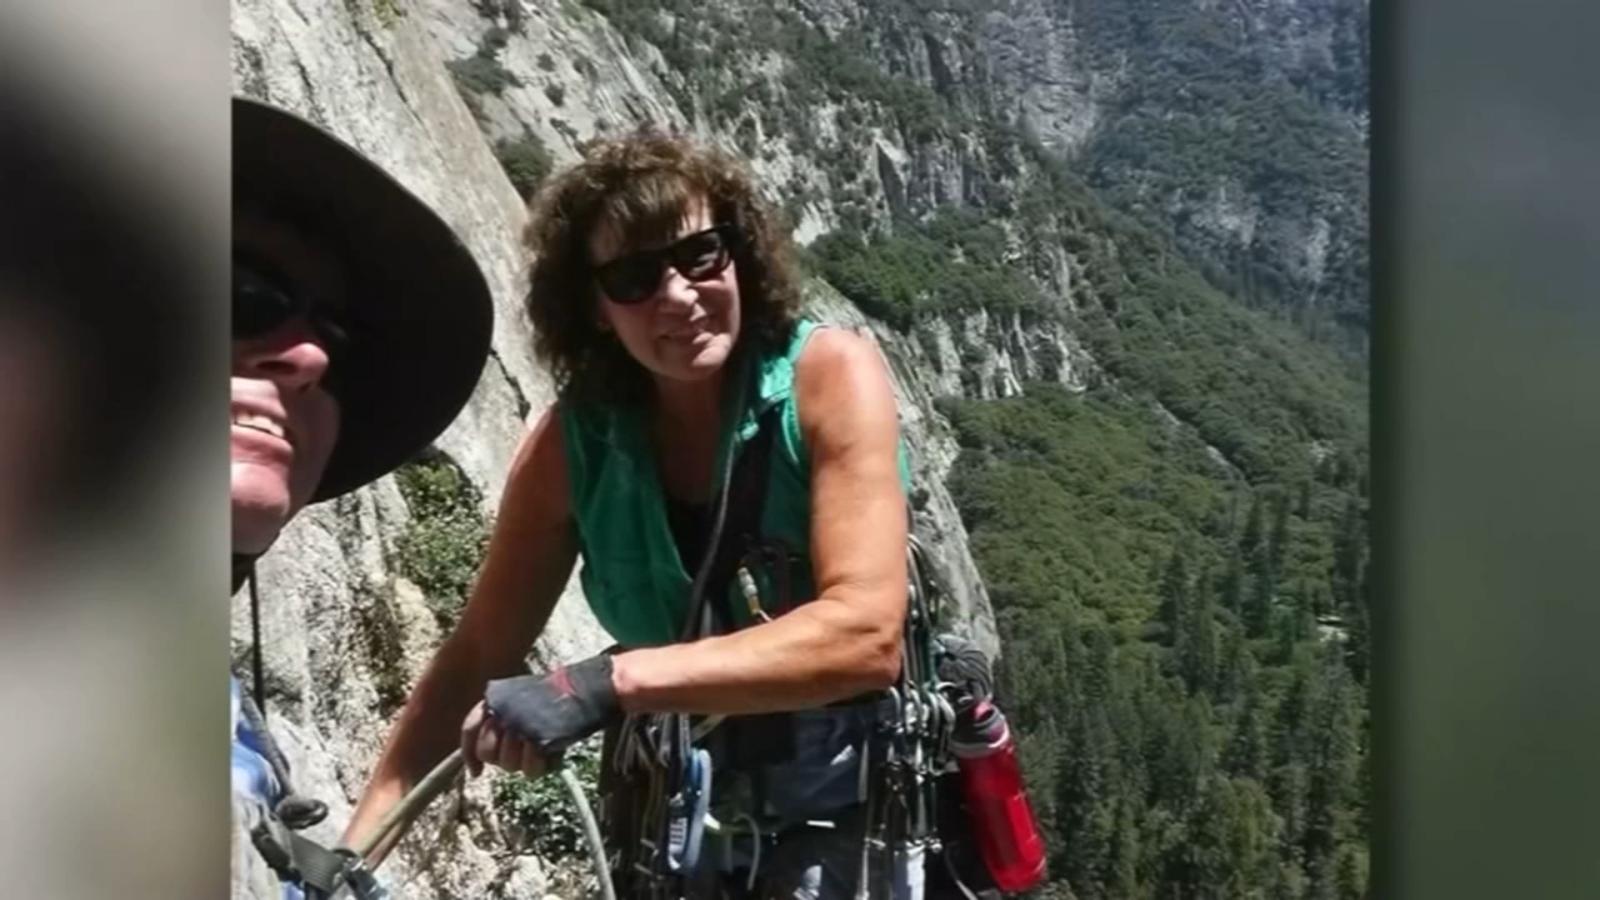 Modesto teacher dies in Yosemite rock climbing accident